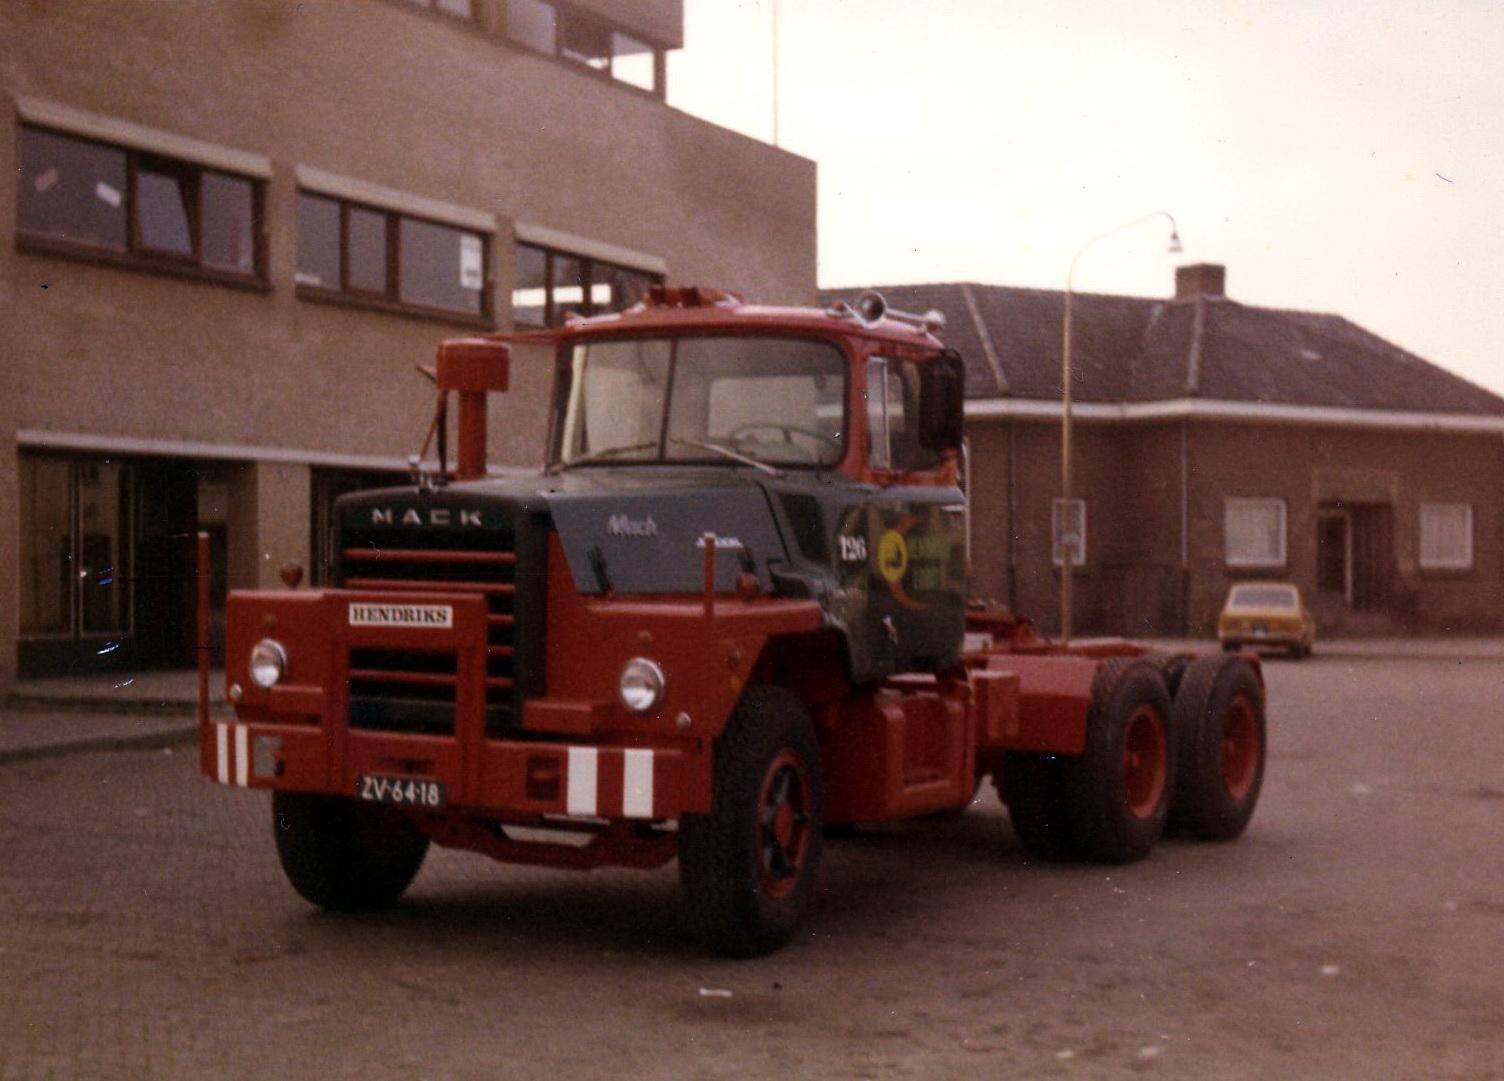 Hendriks-Lobith-Mack-DM609-S-ZV6418-2